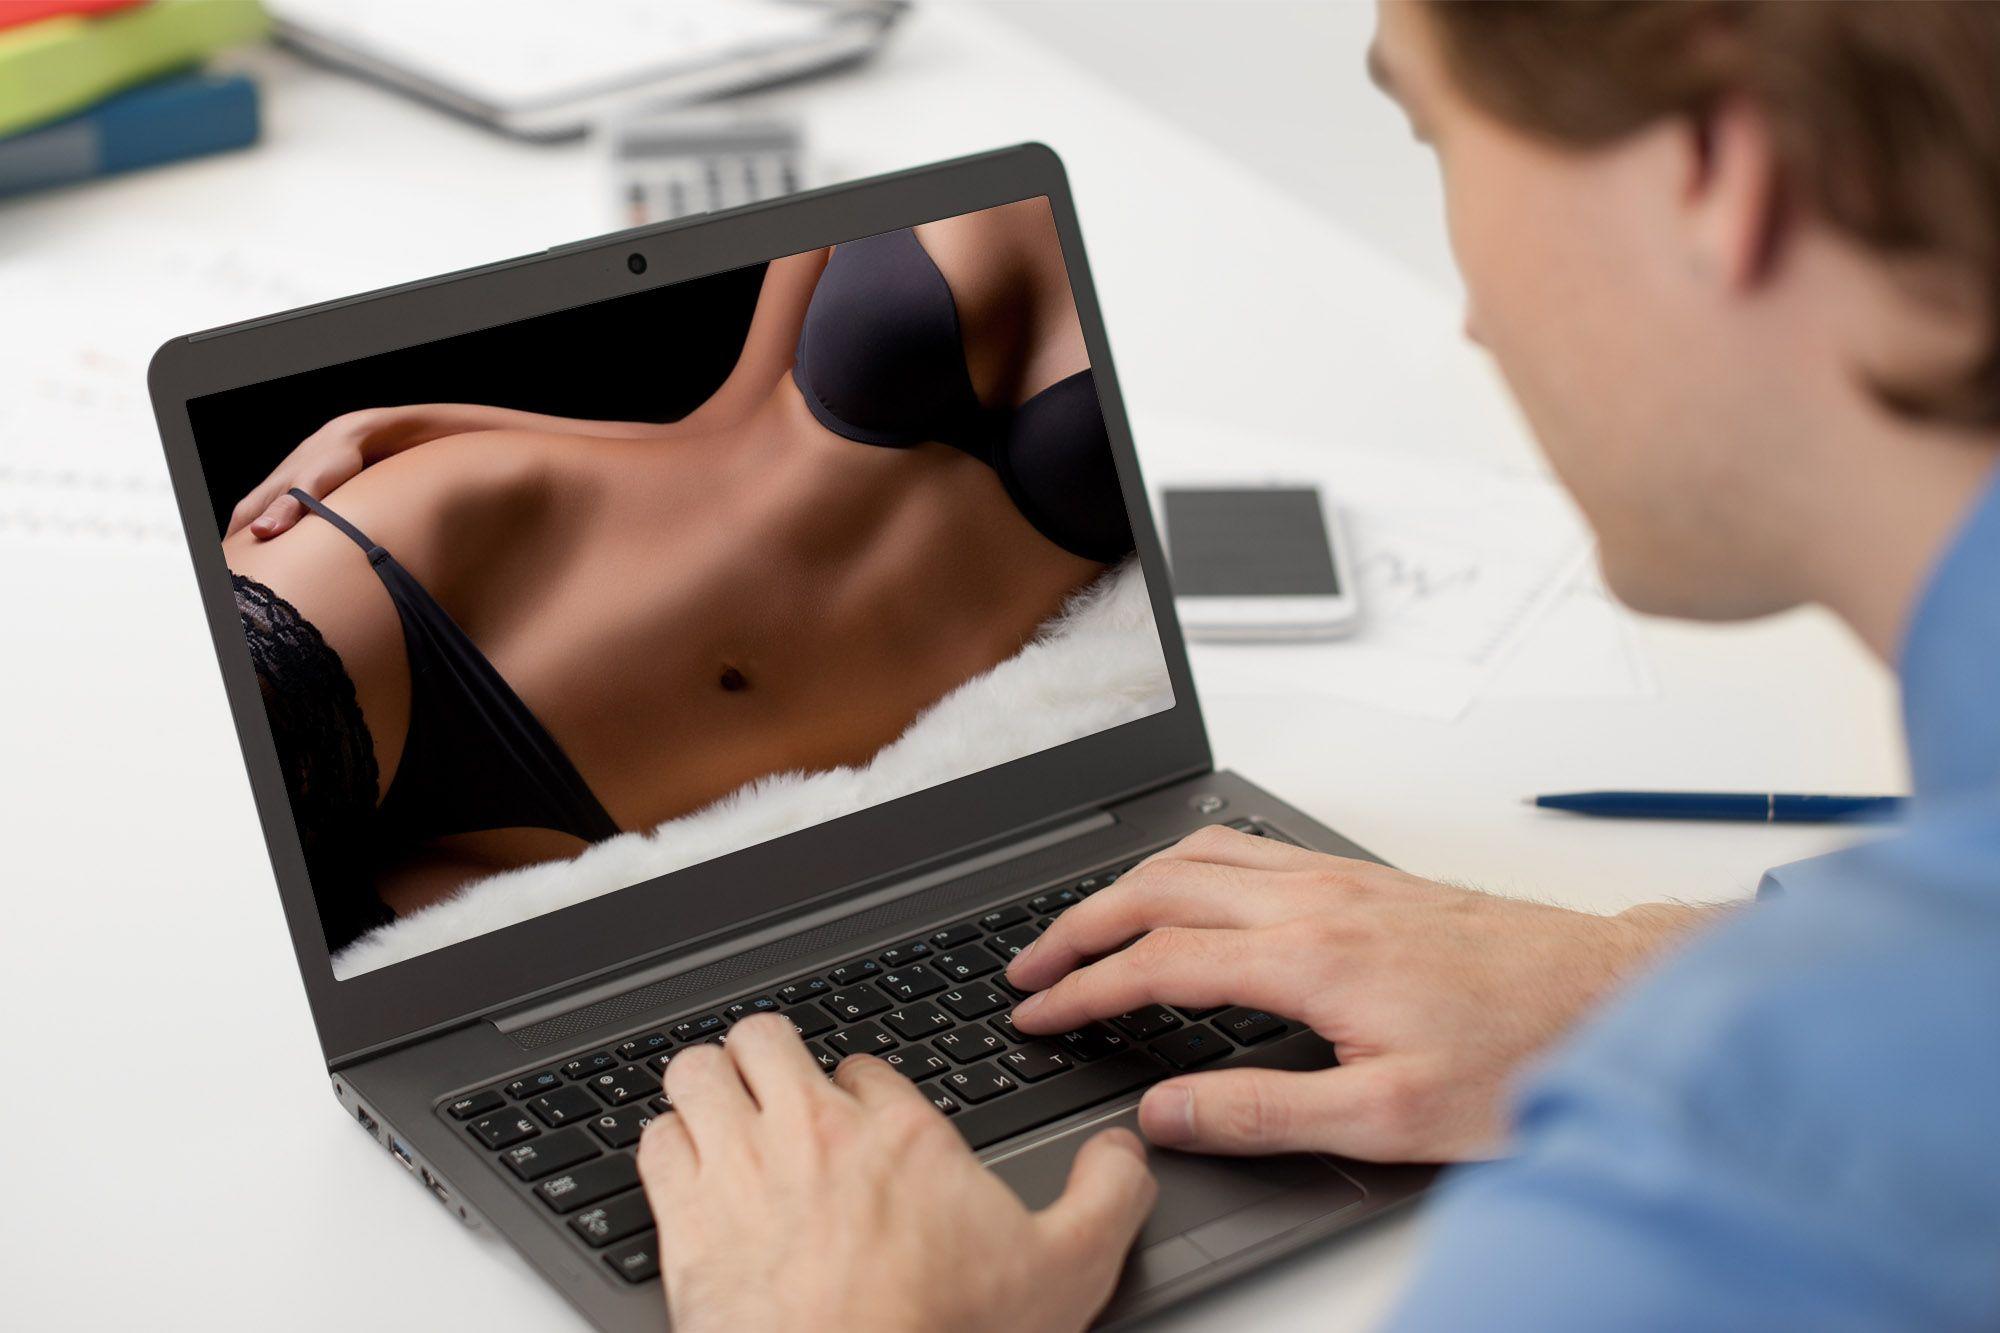 pozi-seks-kartinki-v-internete-porno-bele-porno